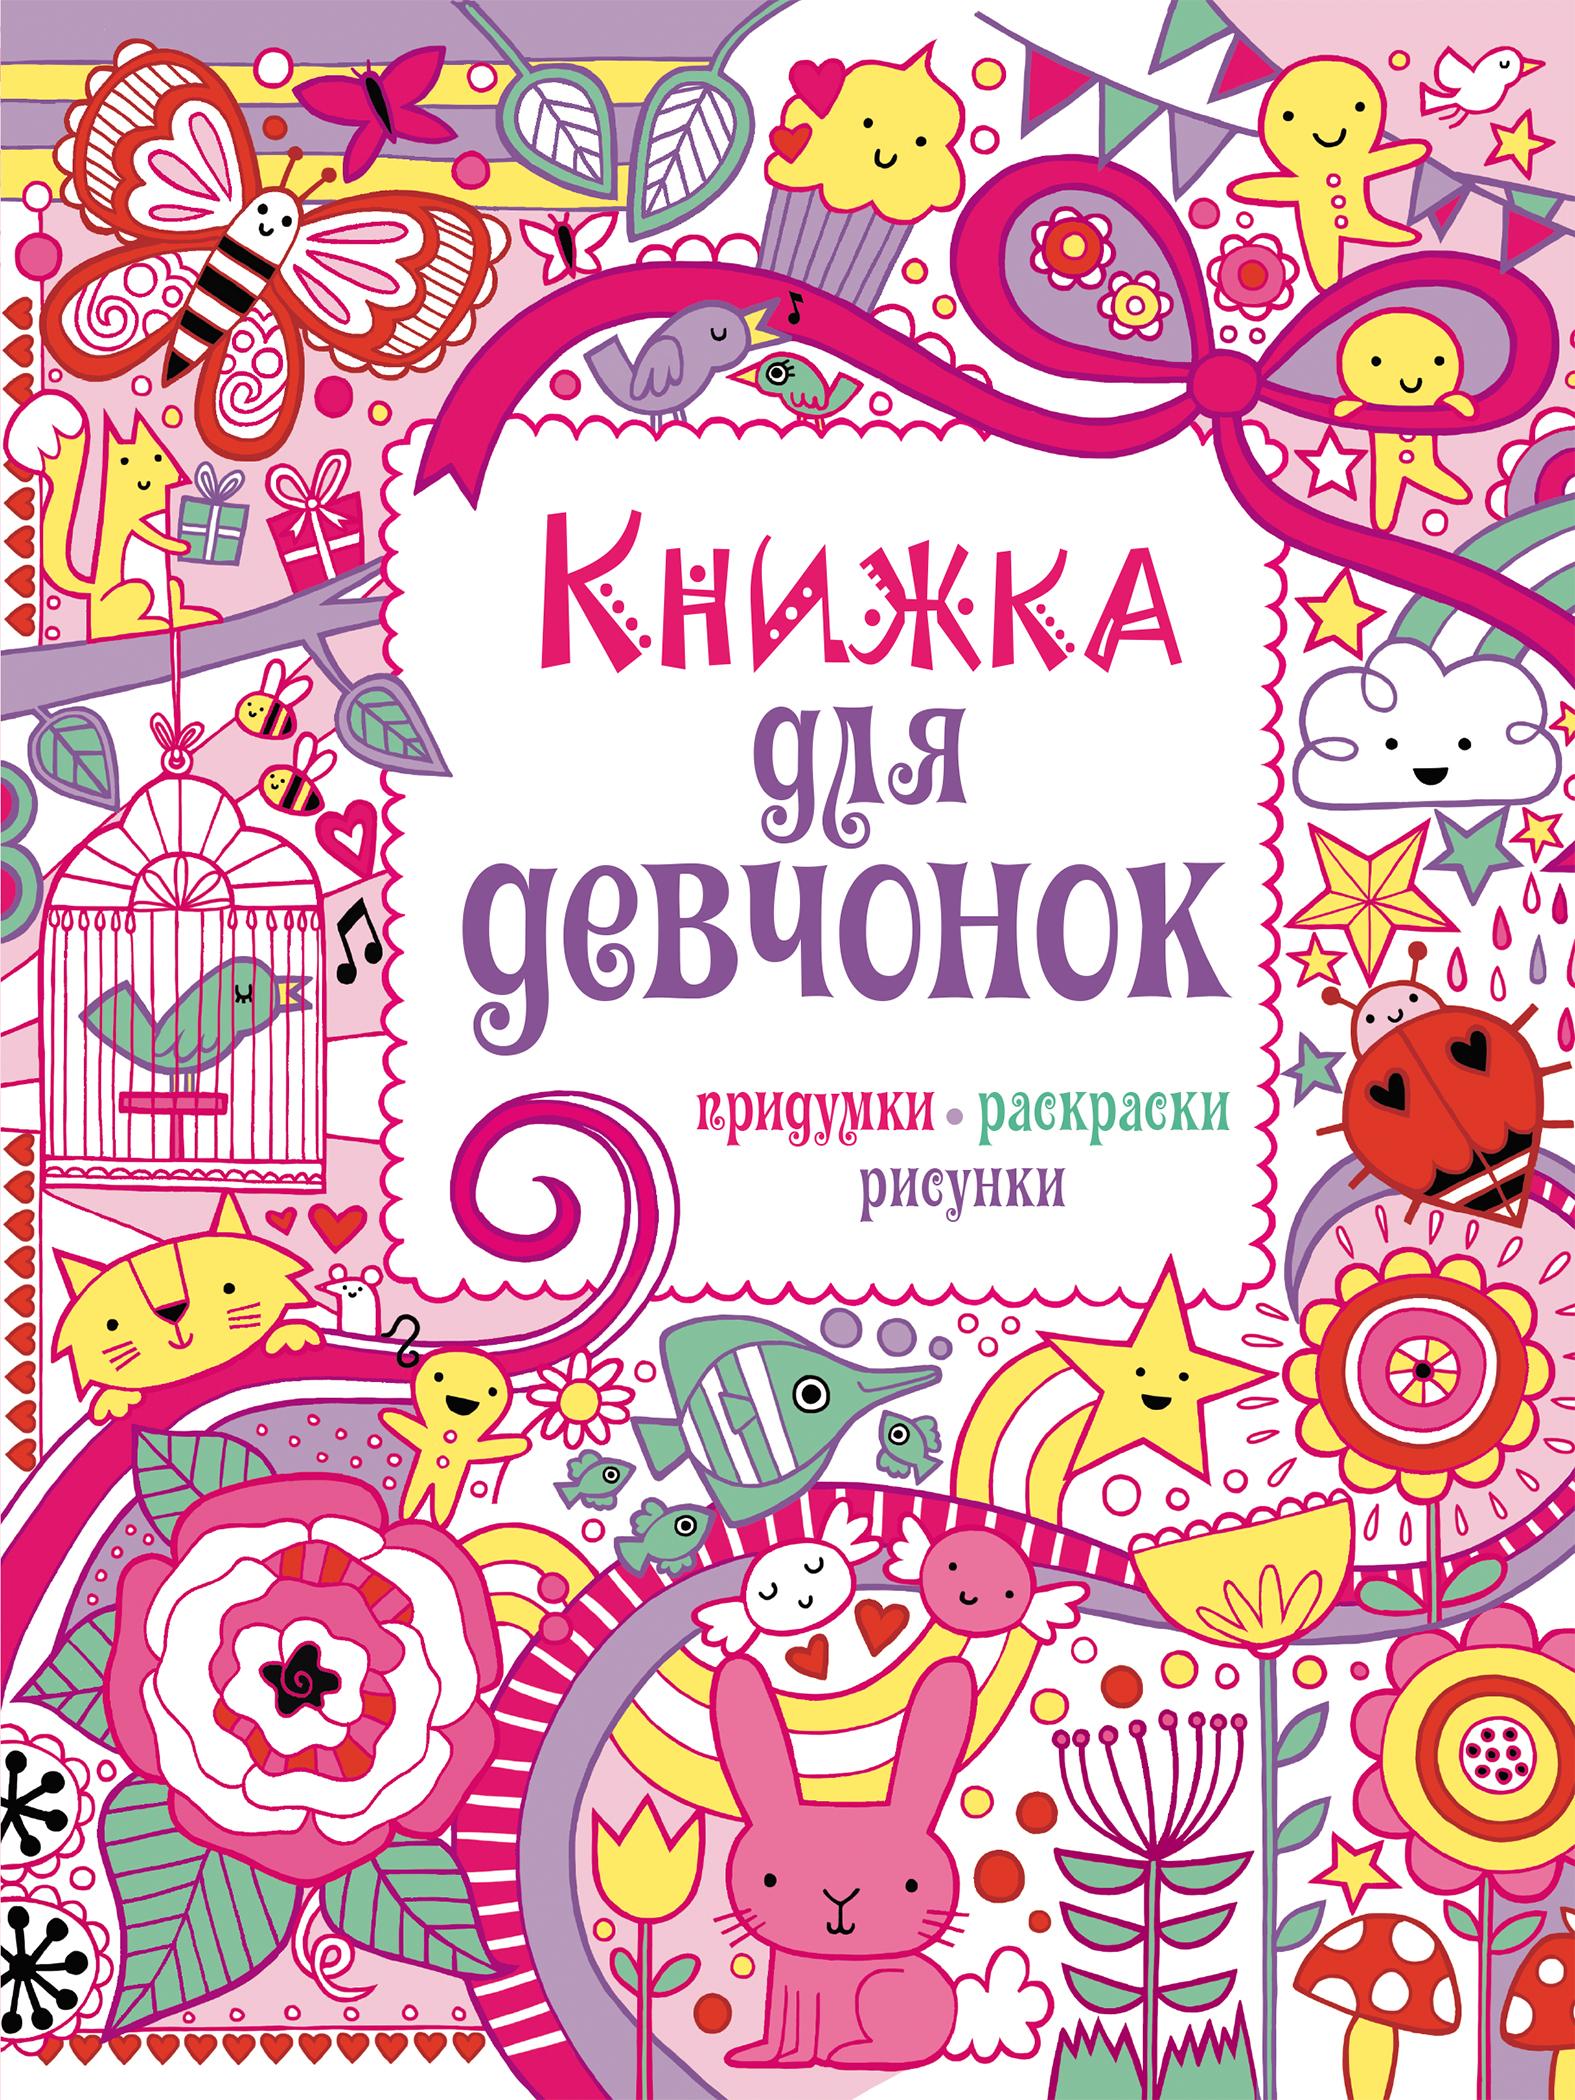 7+ Книжка для девчонок. Придумки, раскраски, рисунки